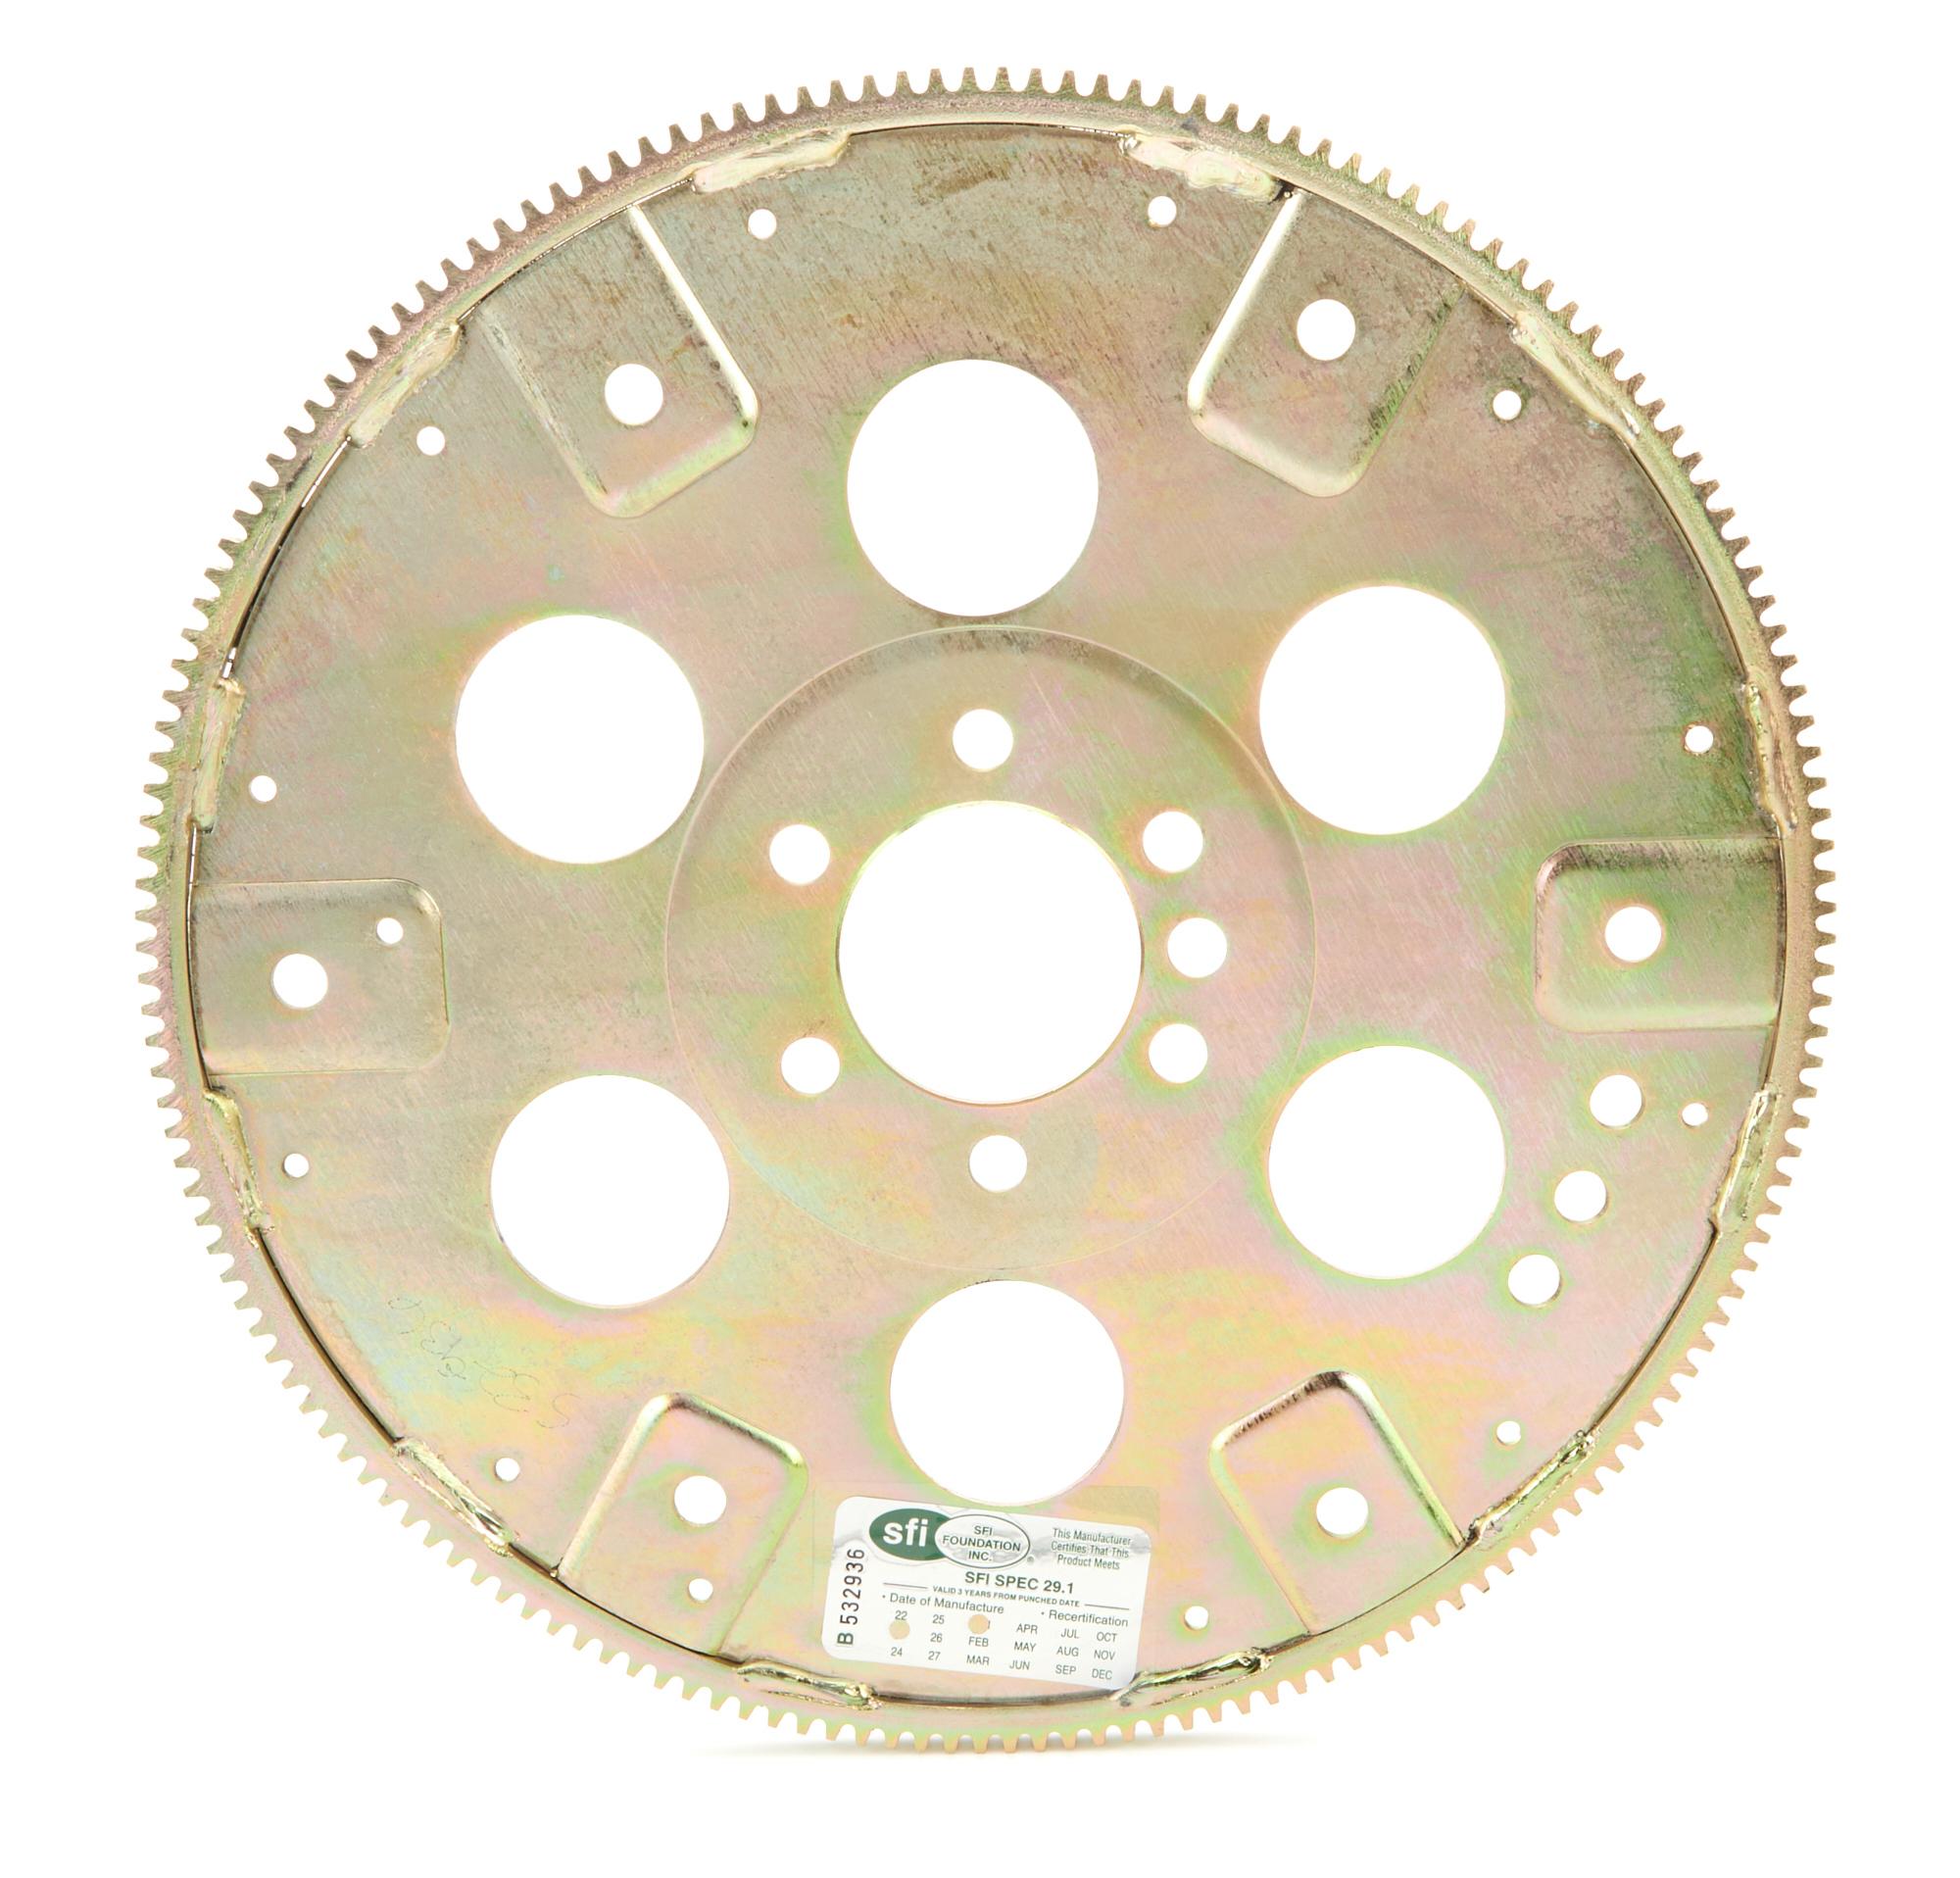 Allstar 26800 Flexplate, 168 Tooth, SFI 29.1, Steel, Internal Balance, 2 Piece Seal, Chevy V8, Each